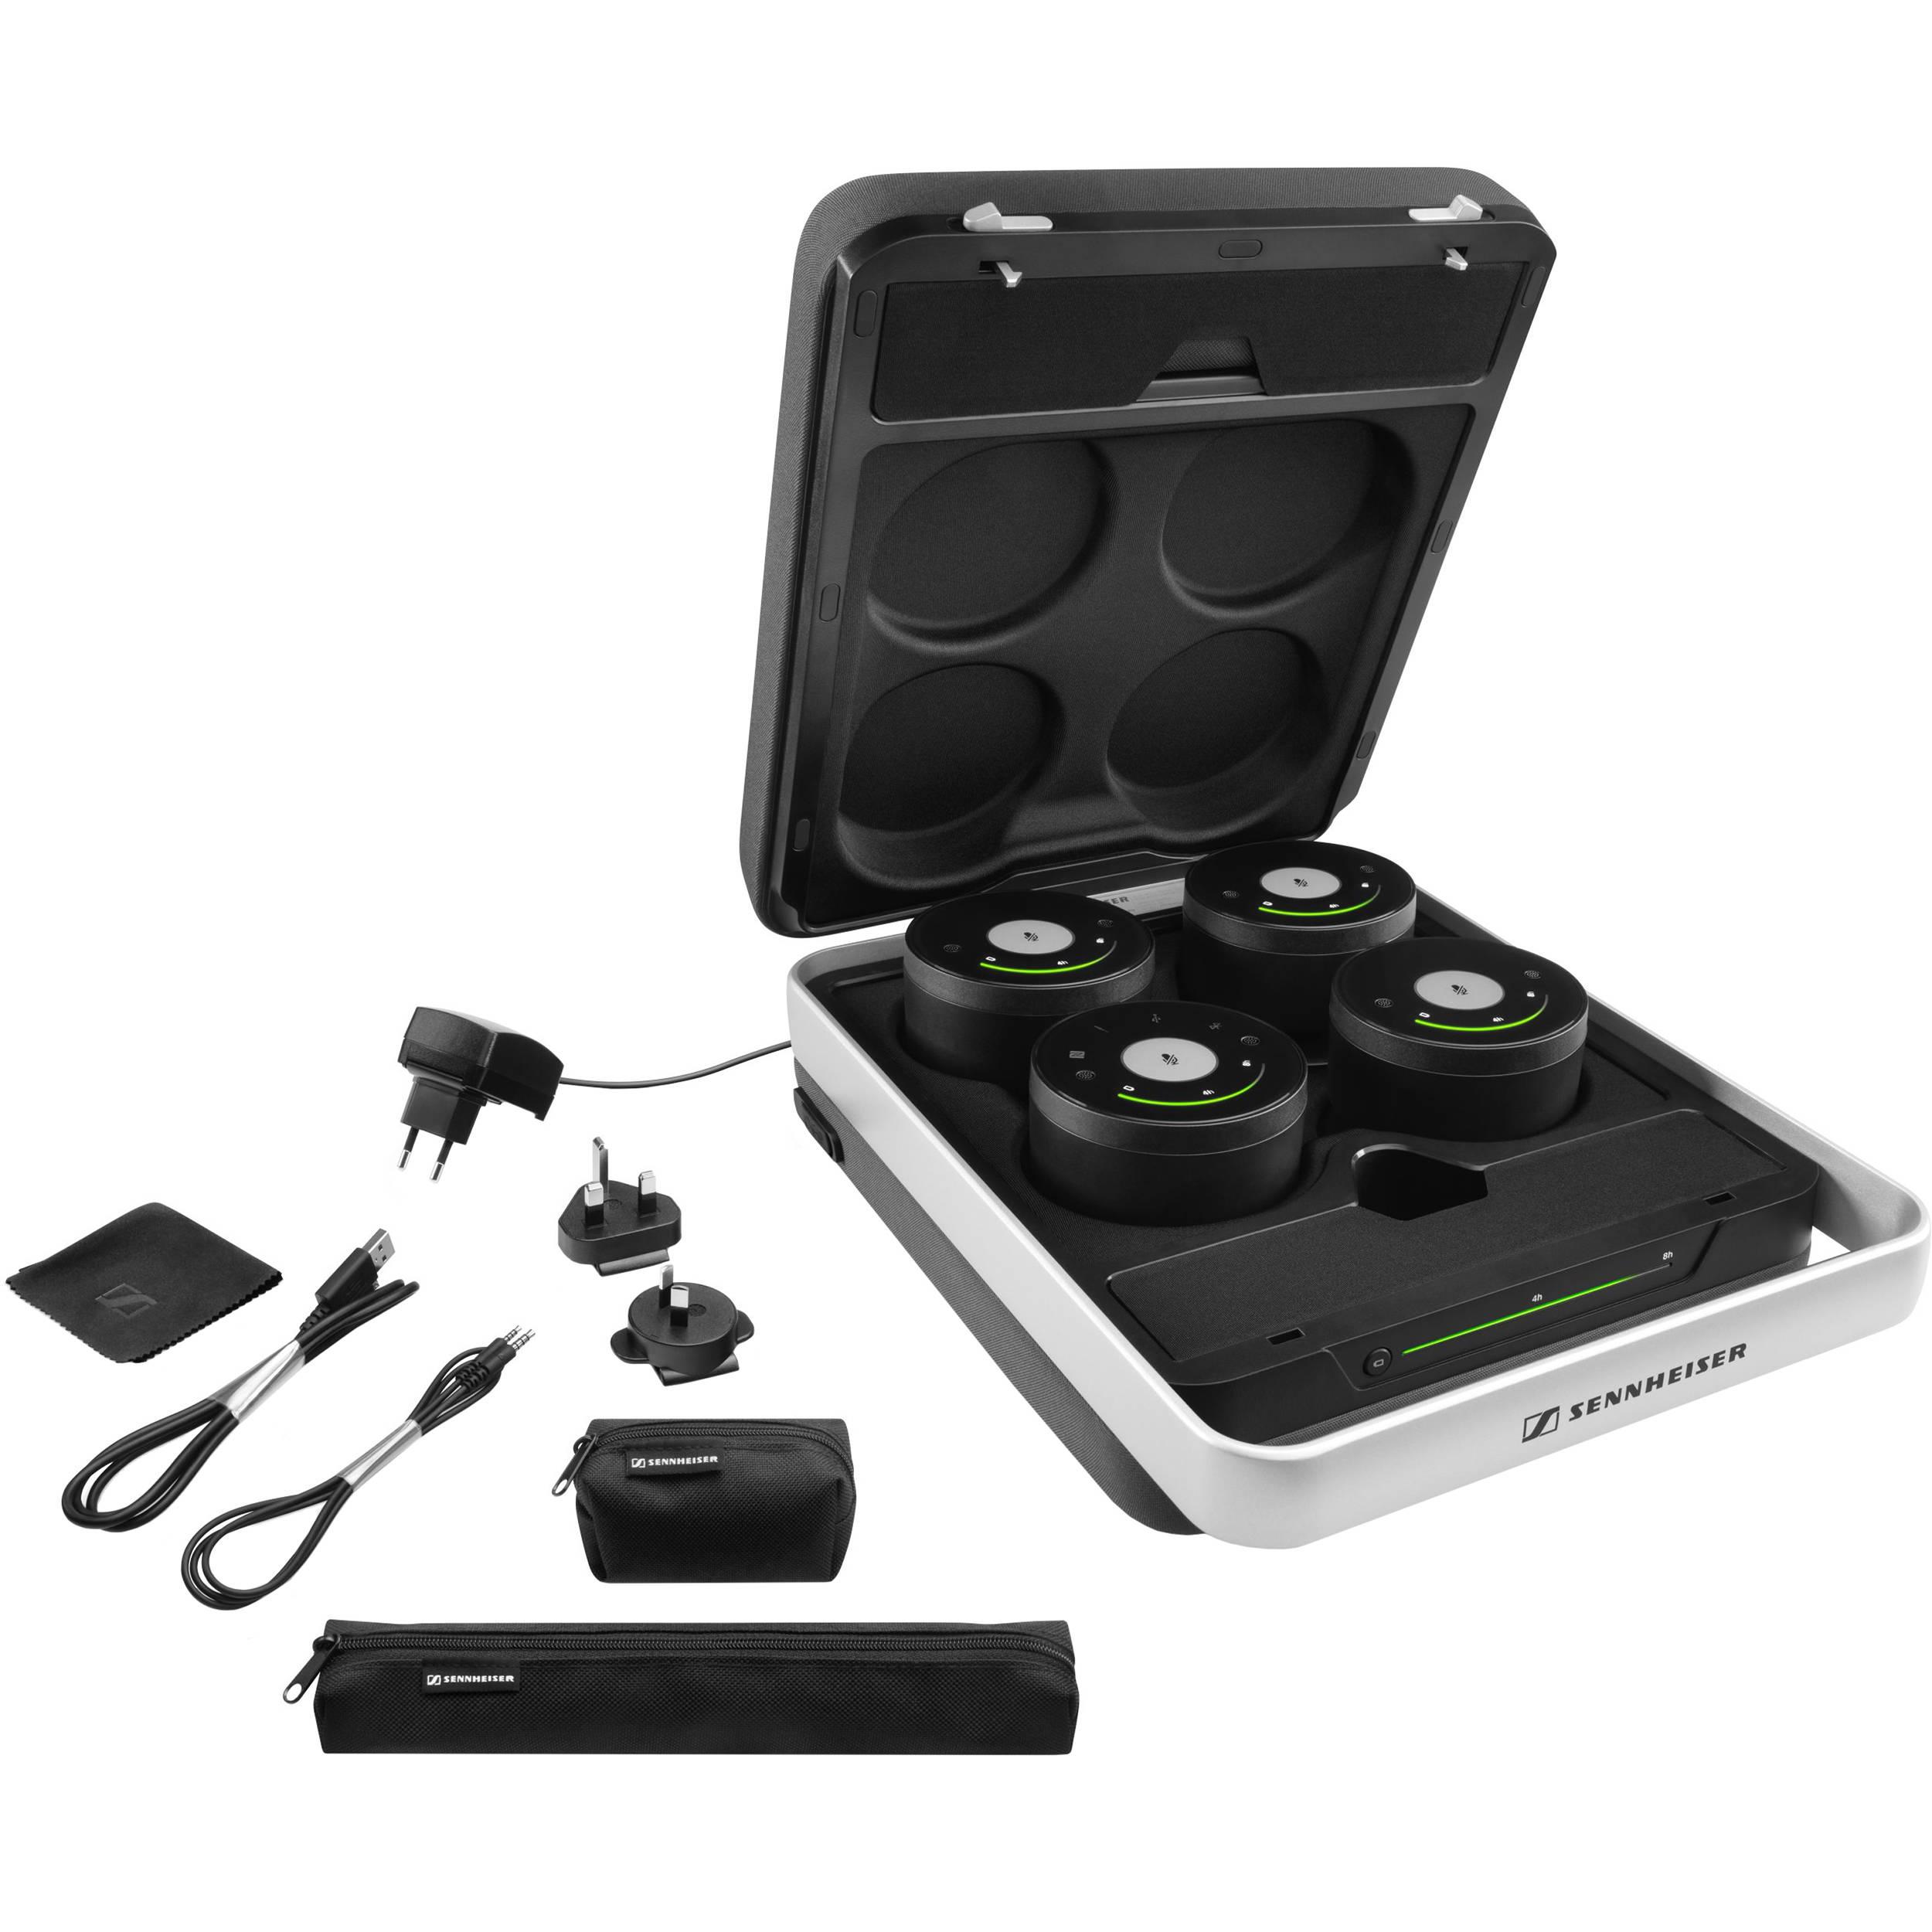 sennheiser teamconnect wireless audio conferencing system 506687. Black Bedroom Furniture Sets. Home Design Ideas